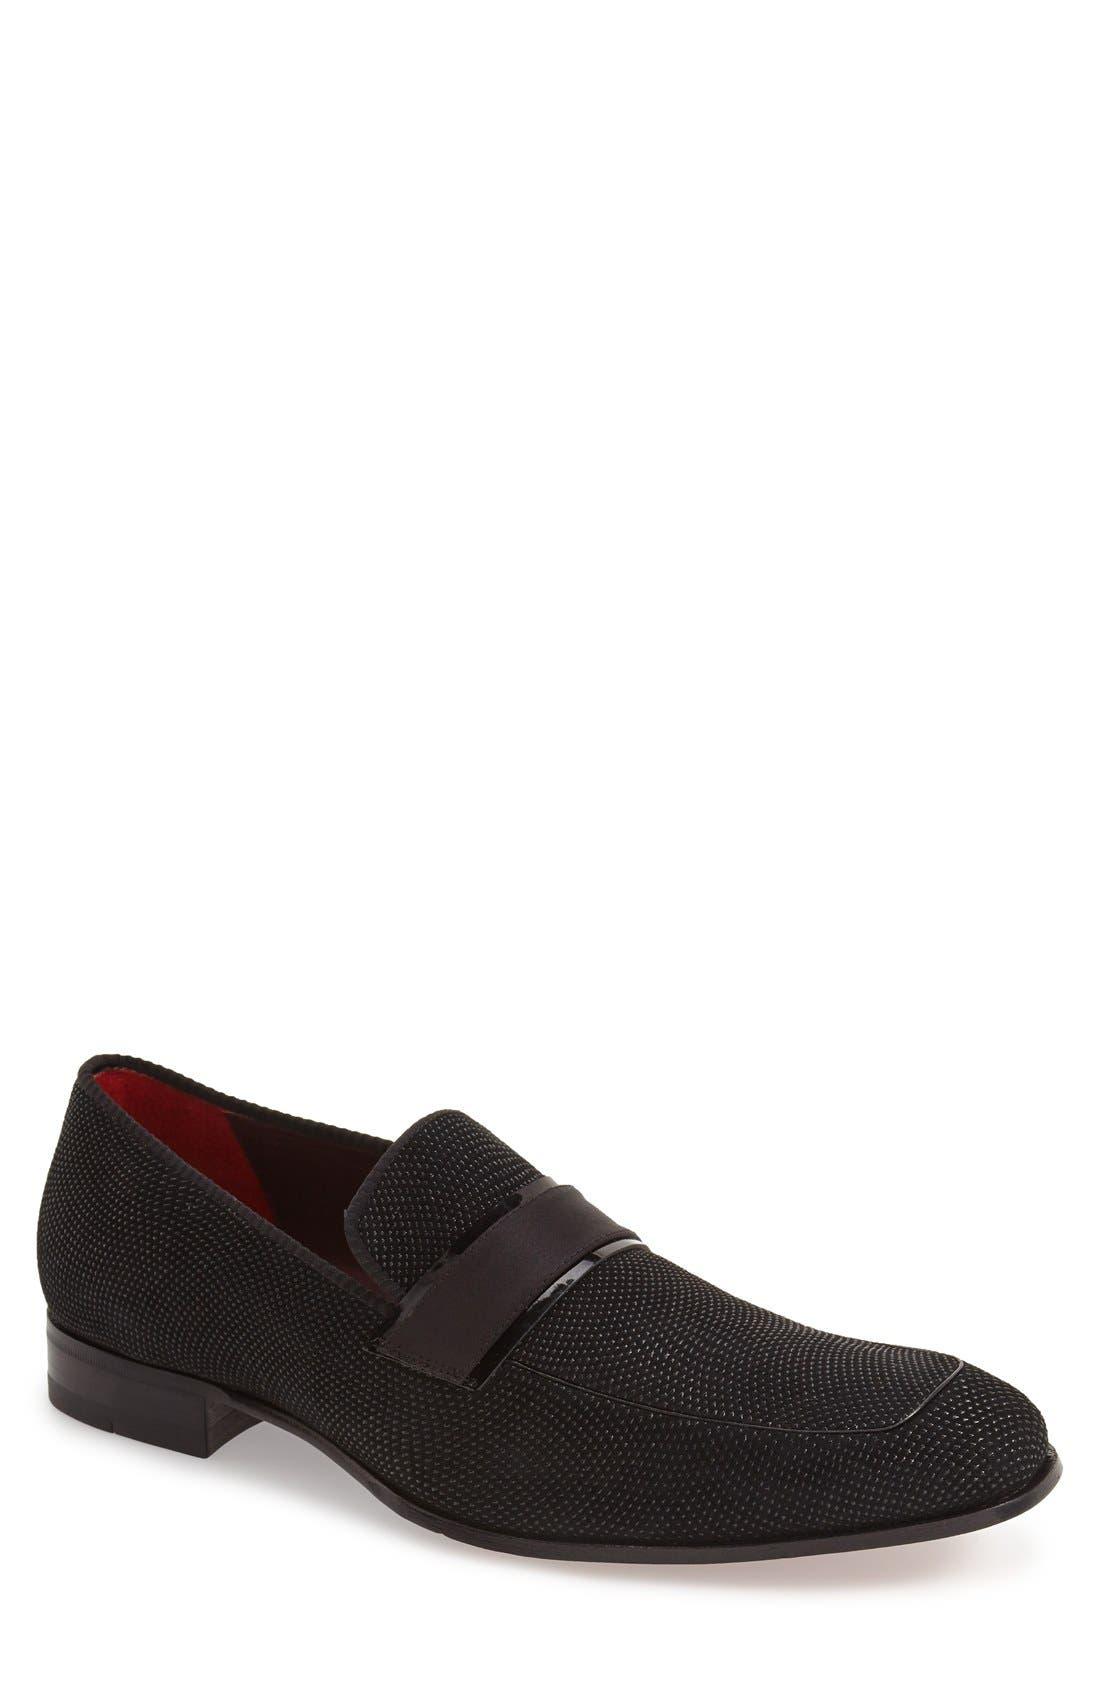 'Capizzi' Venetian Loafer,                             Main thumbnail 1, color,                             BLACK